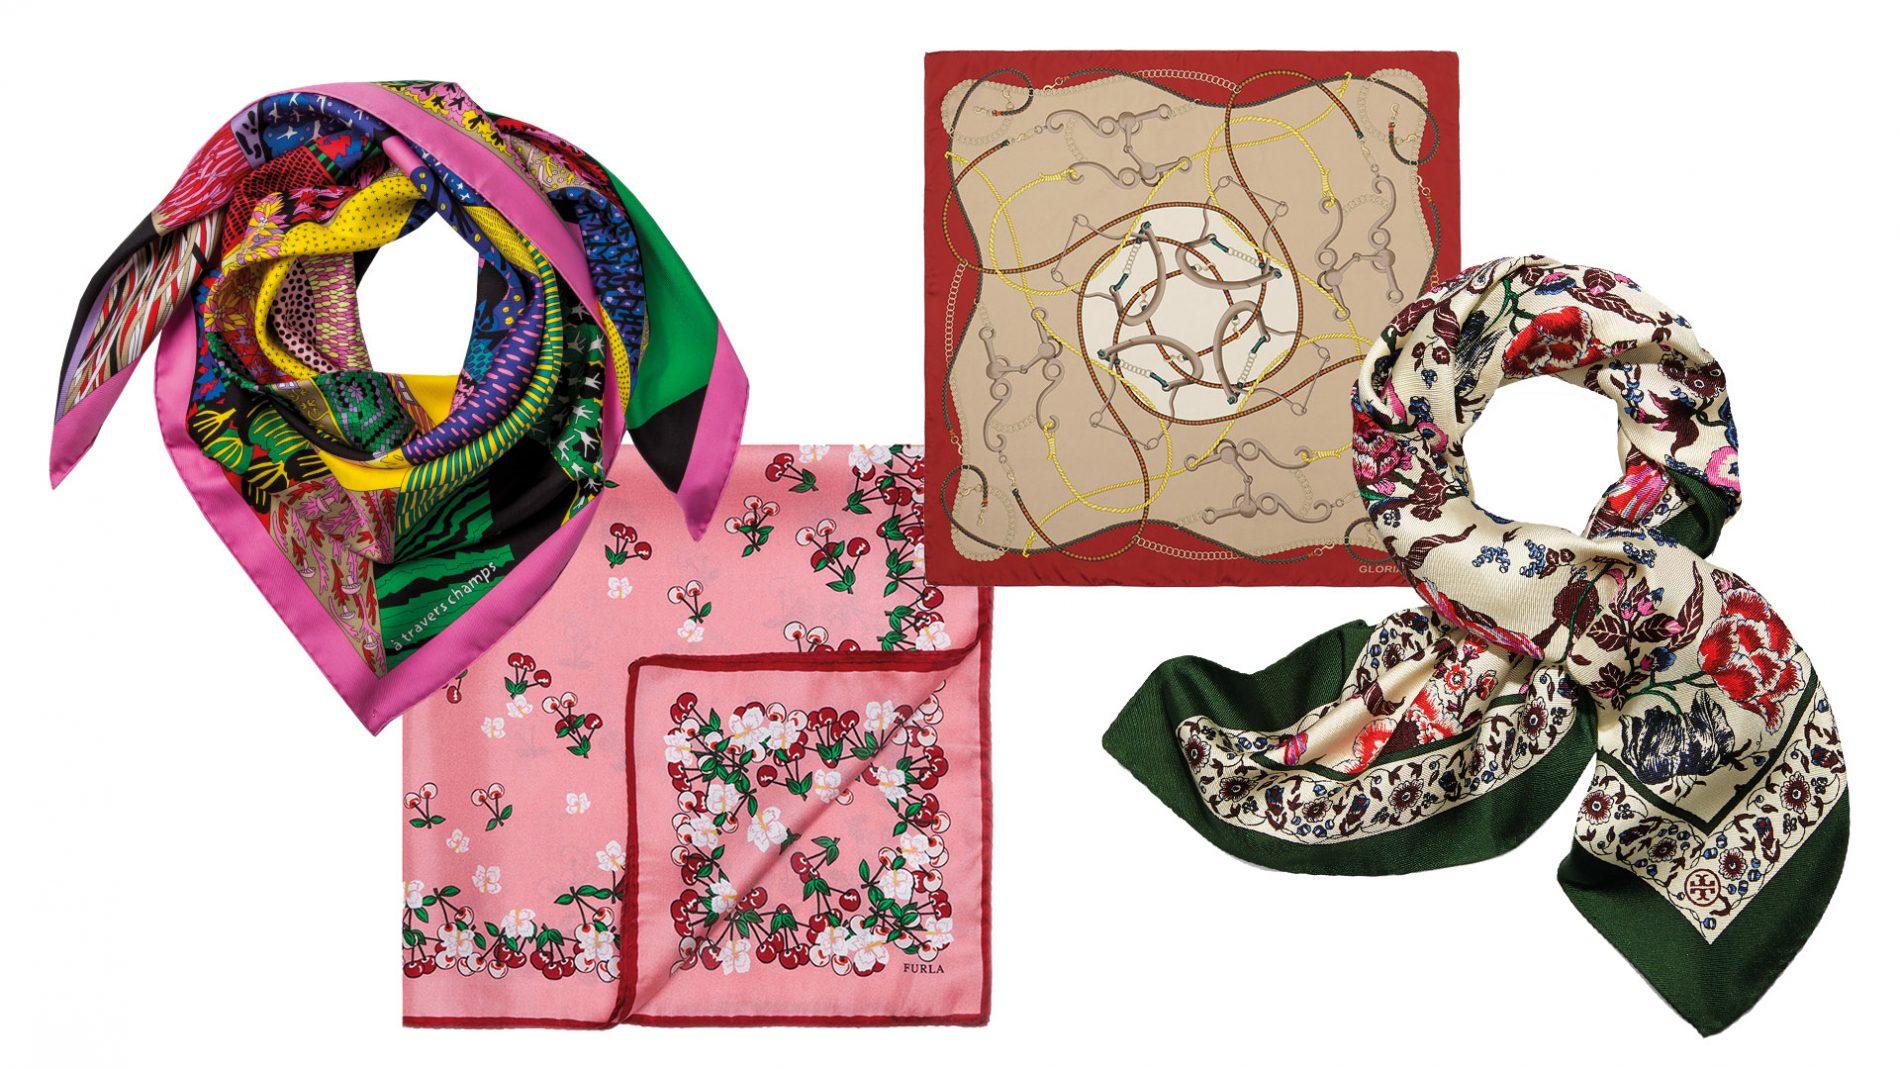 El Corte Inglés Diseñador Pañuelo Accesorios Tory Burch Hermès Furla Gloria Ortiz